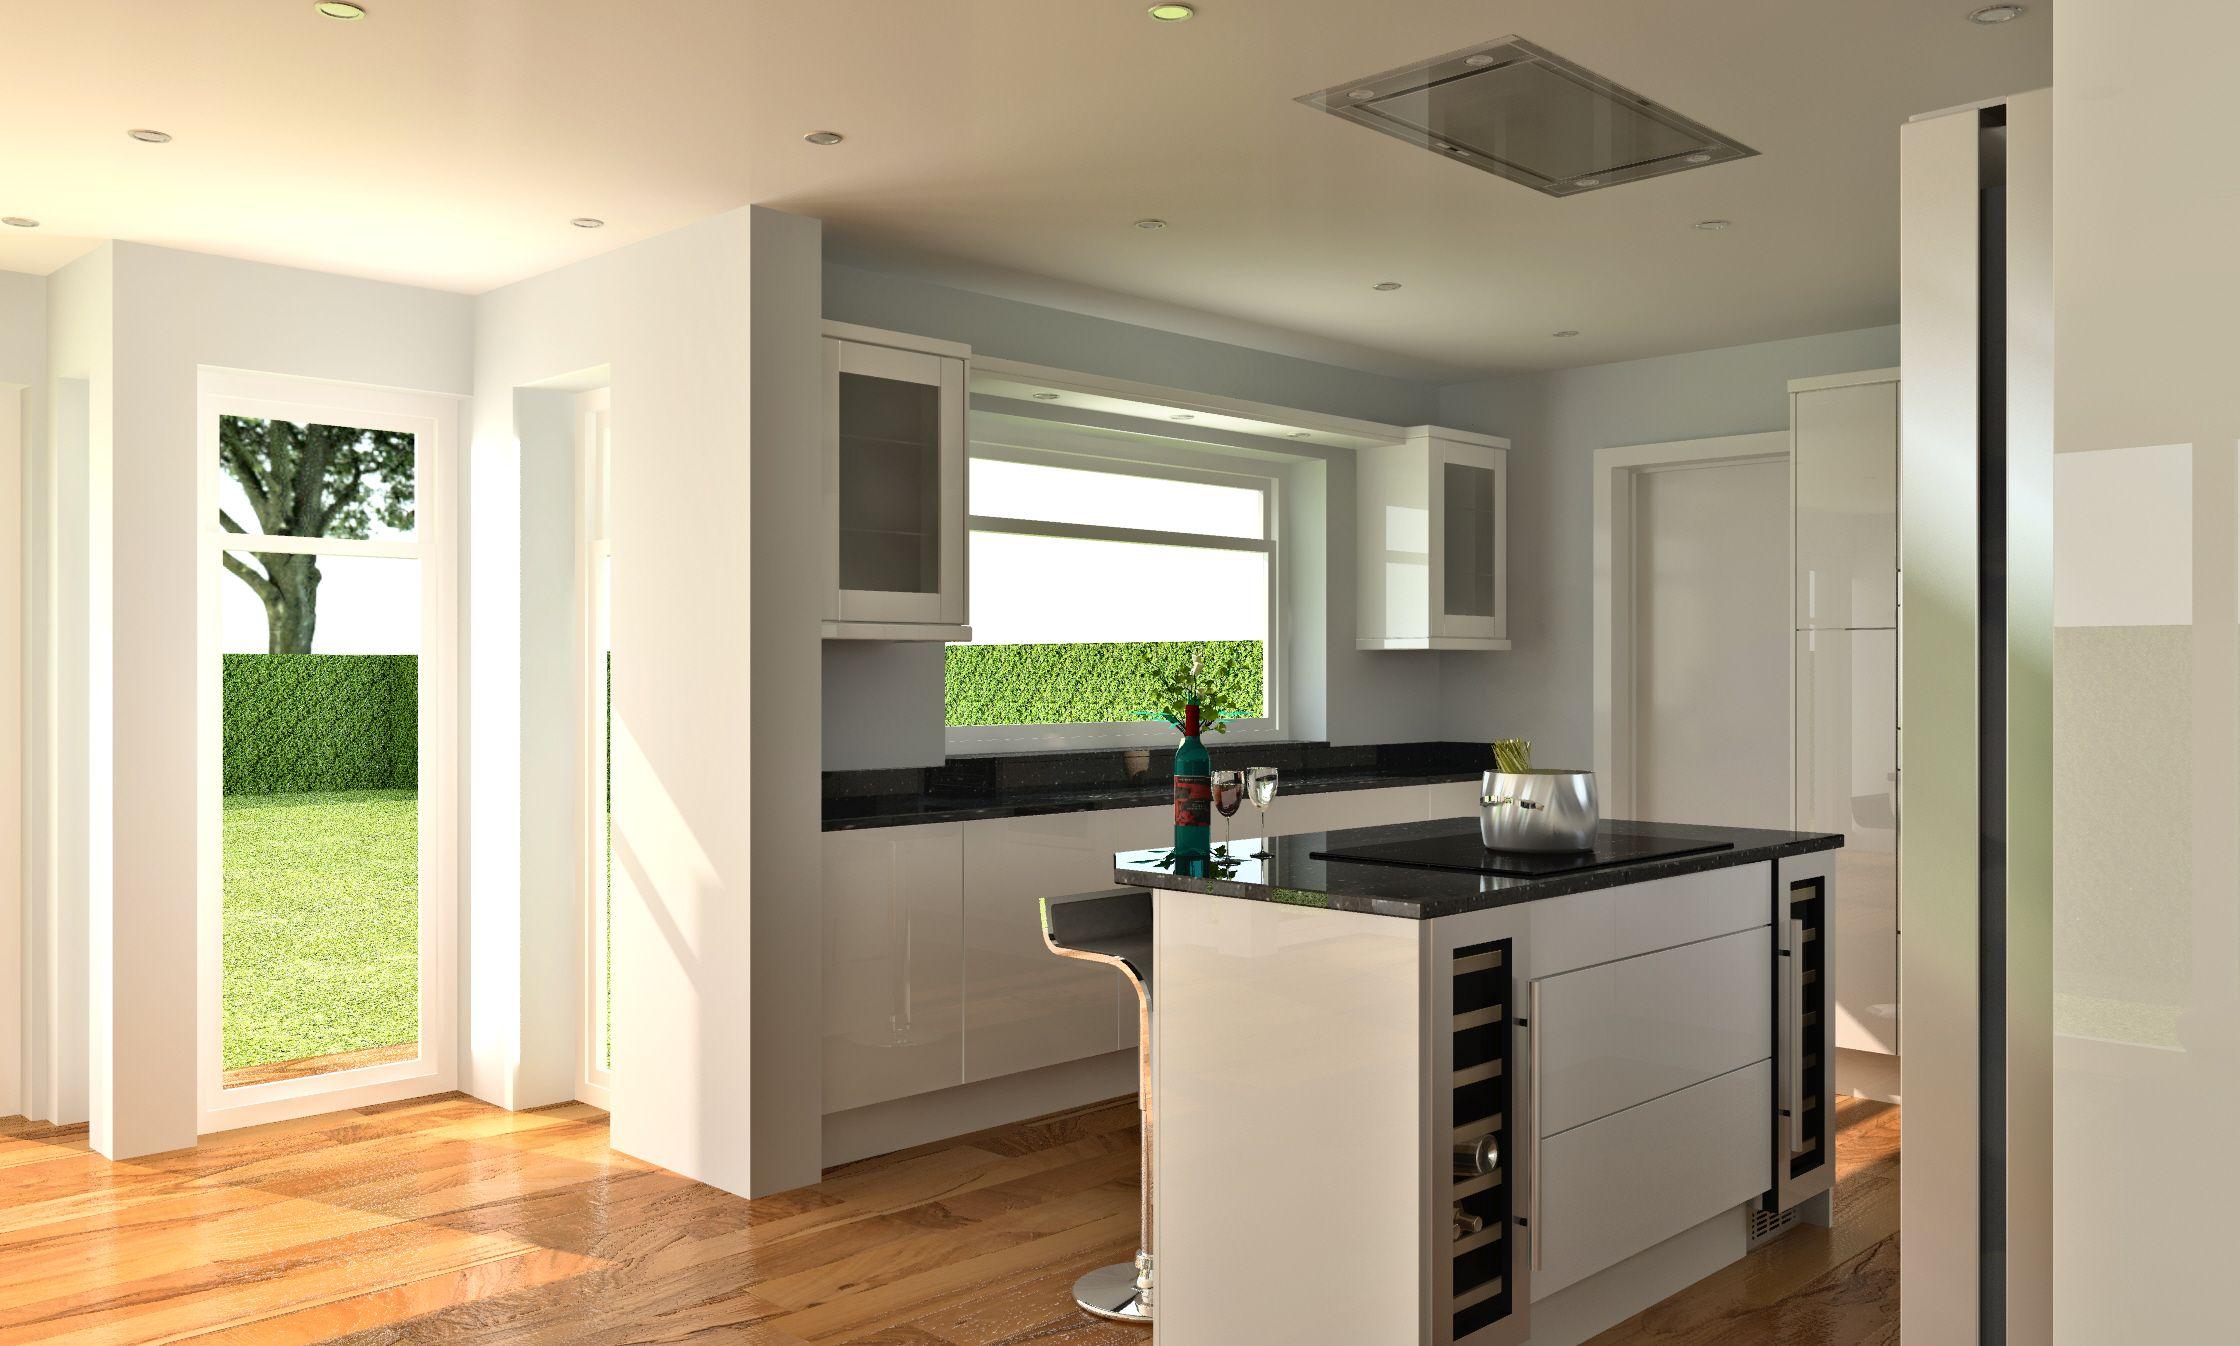 redsdk kitchen render created by darrel durose using turbocad pro